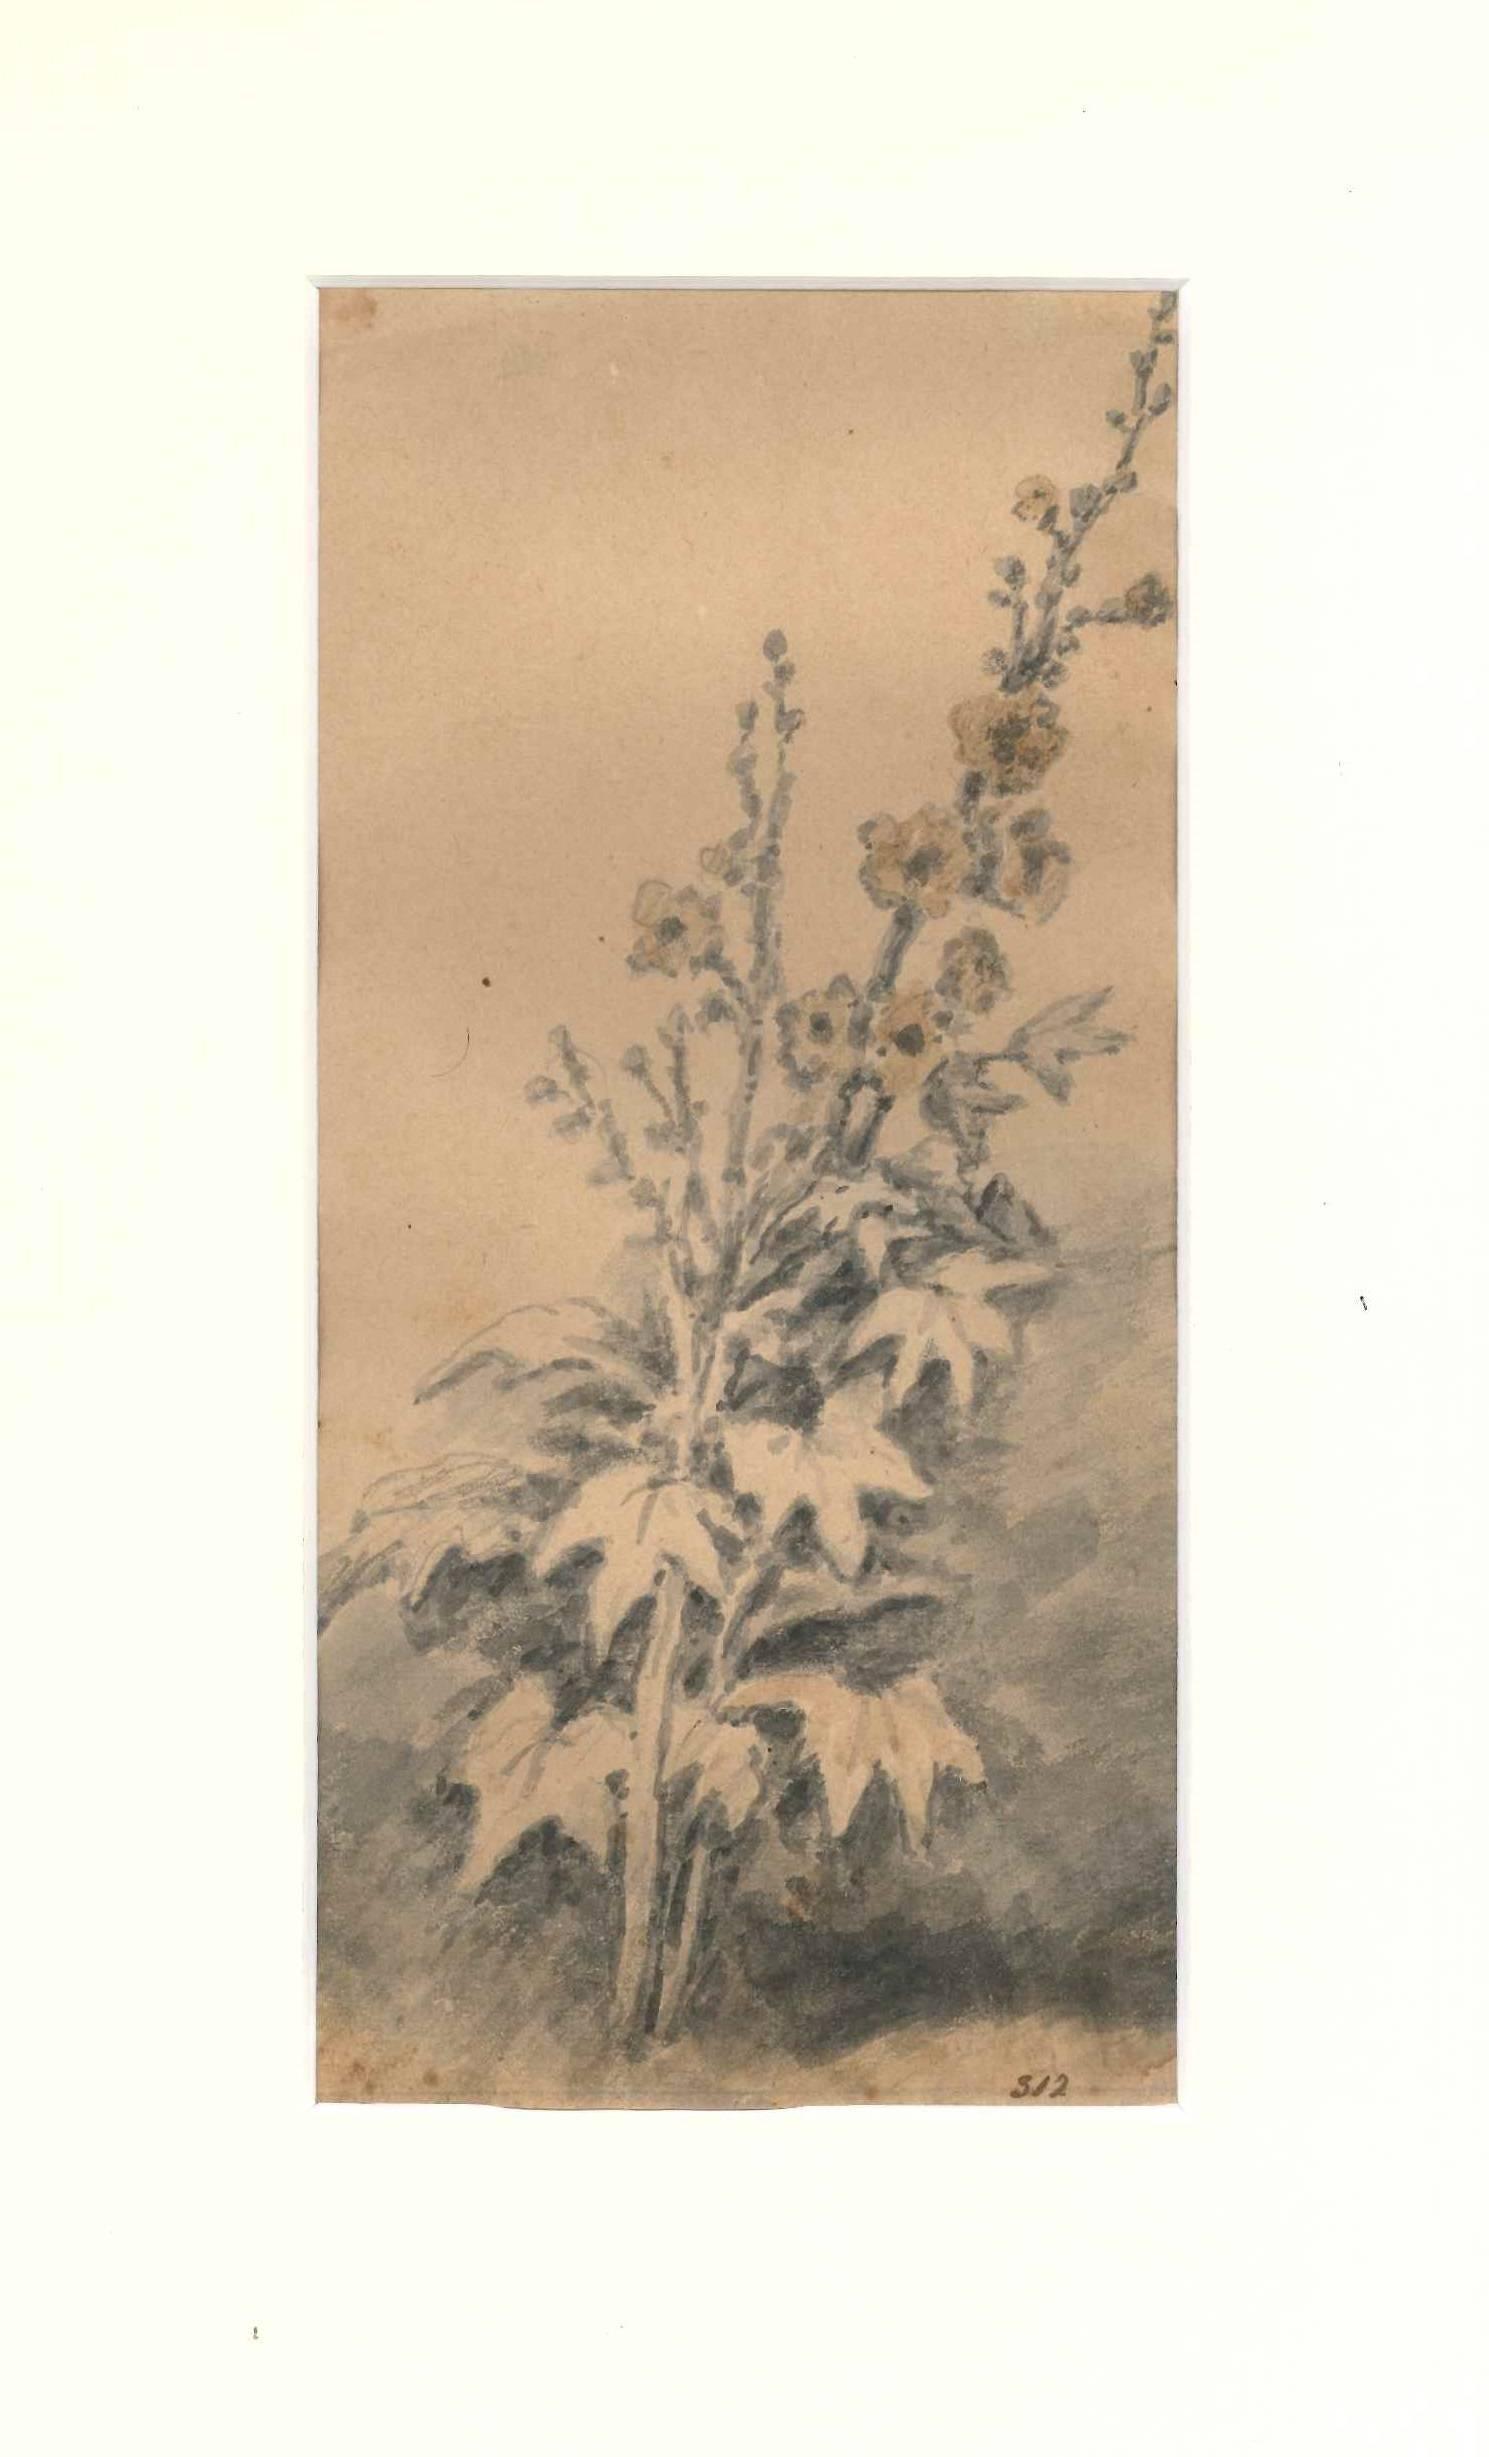 Flora Study - Original Drawing by J. P. Verdussen - End of 18th Century